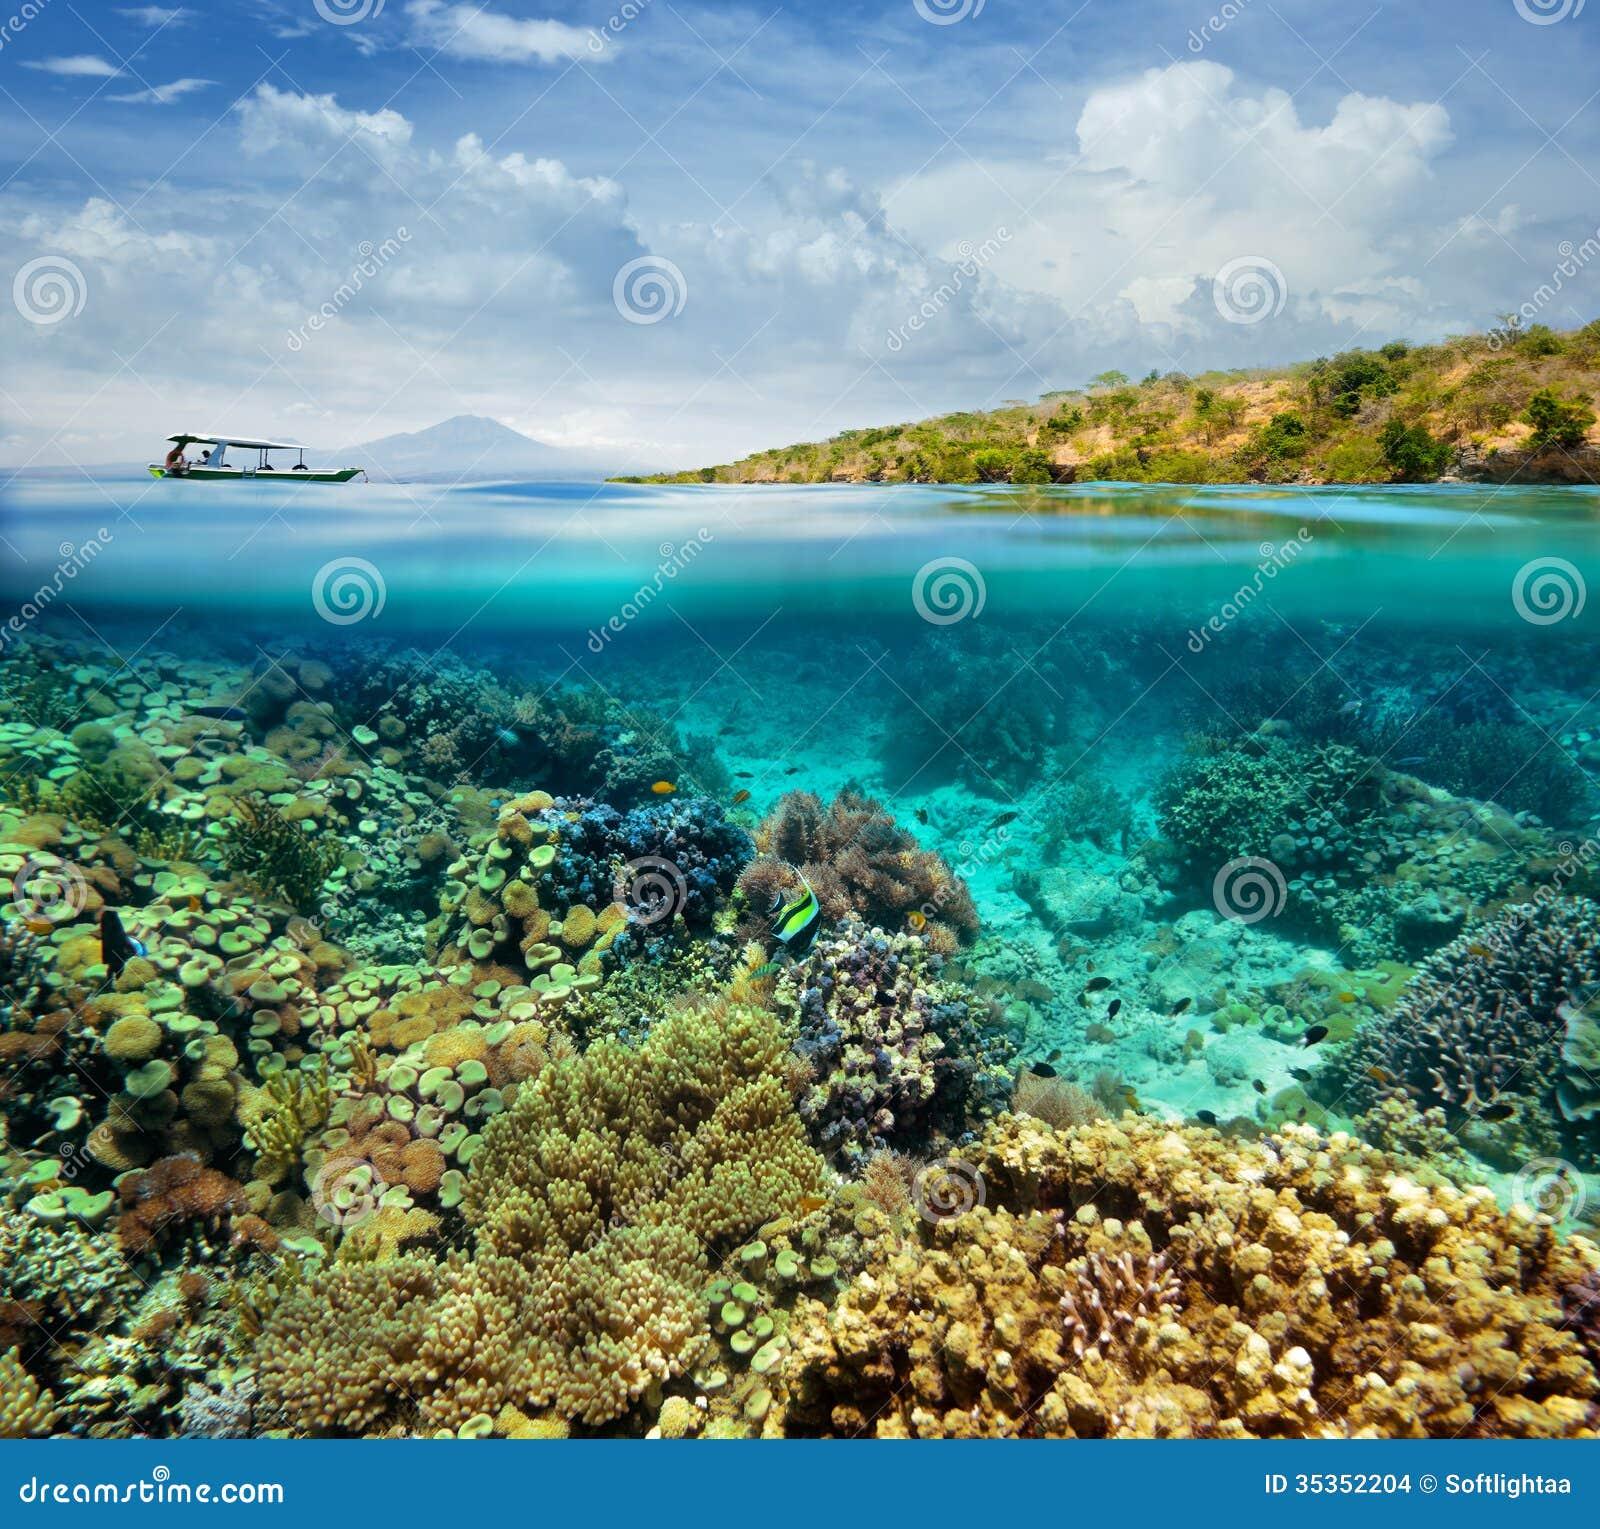 Coral Reef On The Island Of Menjangan Indonesia Stock